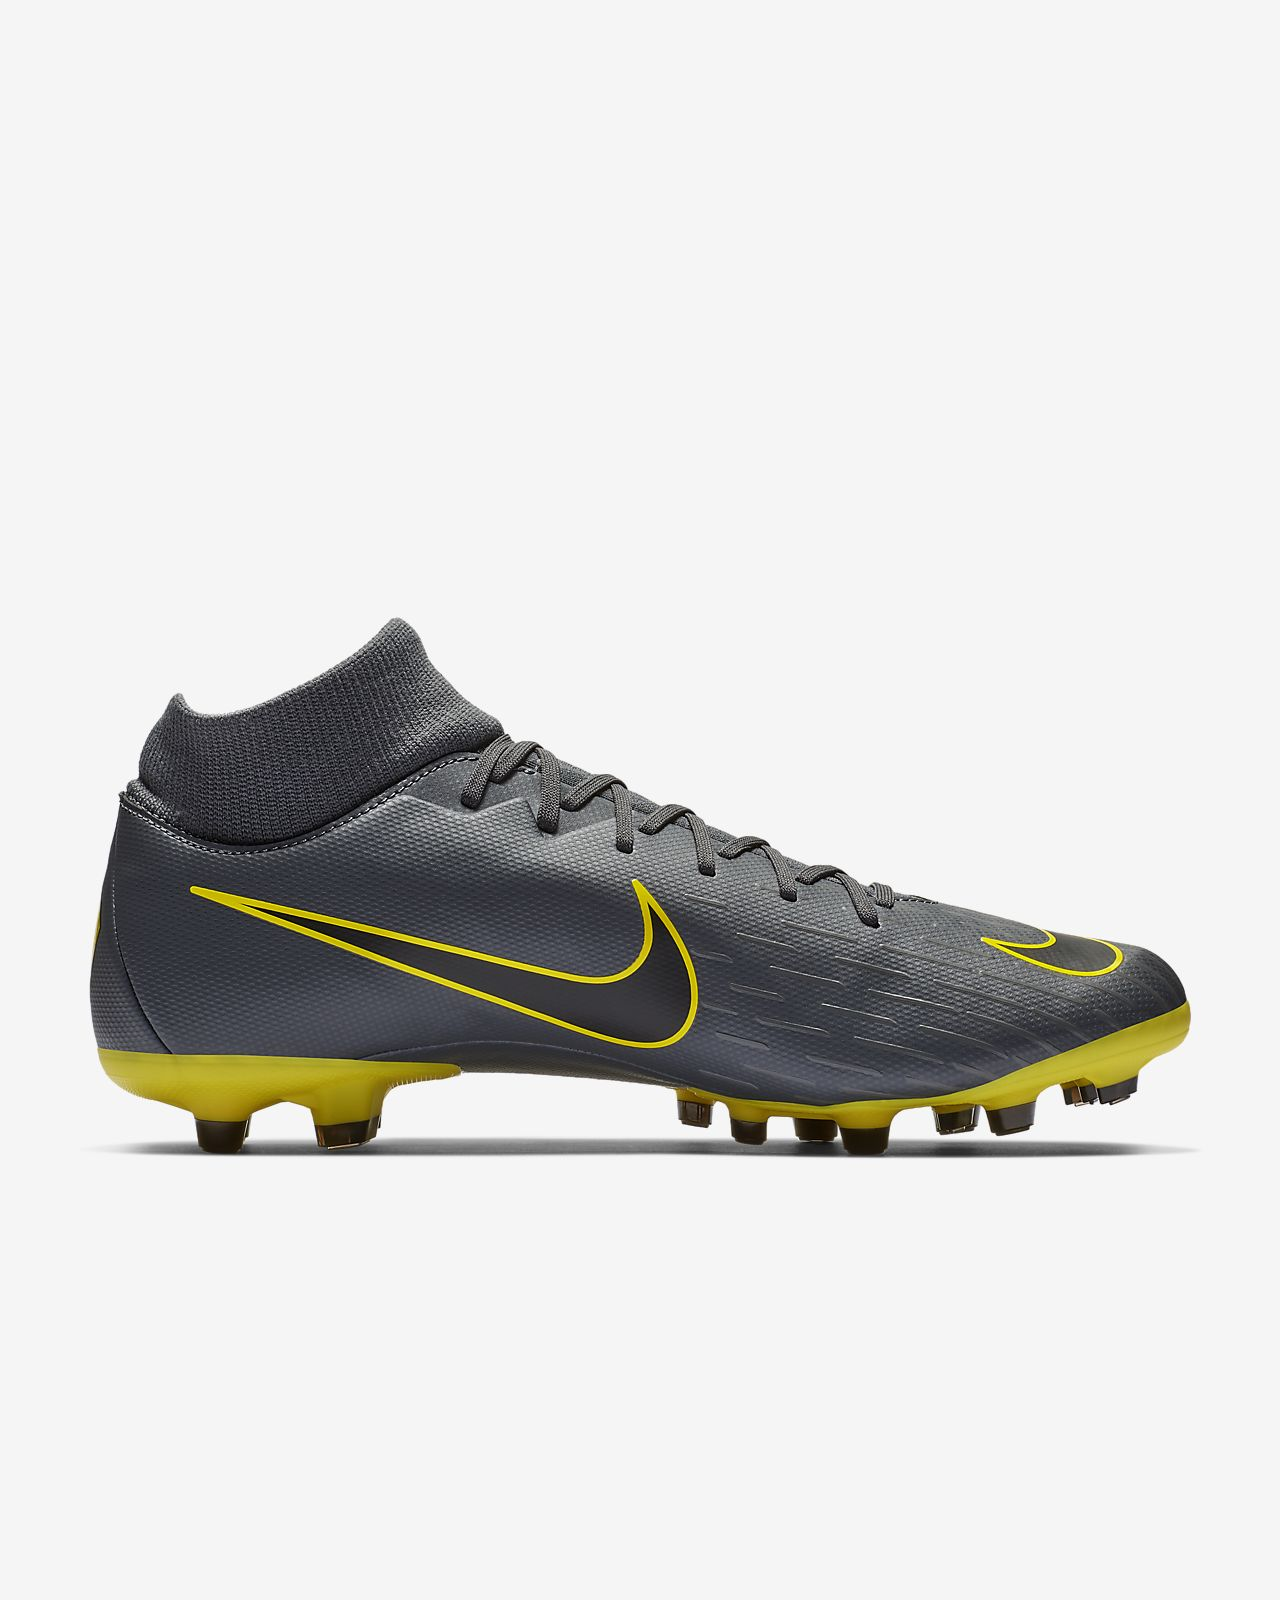 979e7374a20418 Nike Mercurial Superfly 6 Academy MG Multi-Ground Football Boot ...